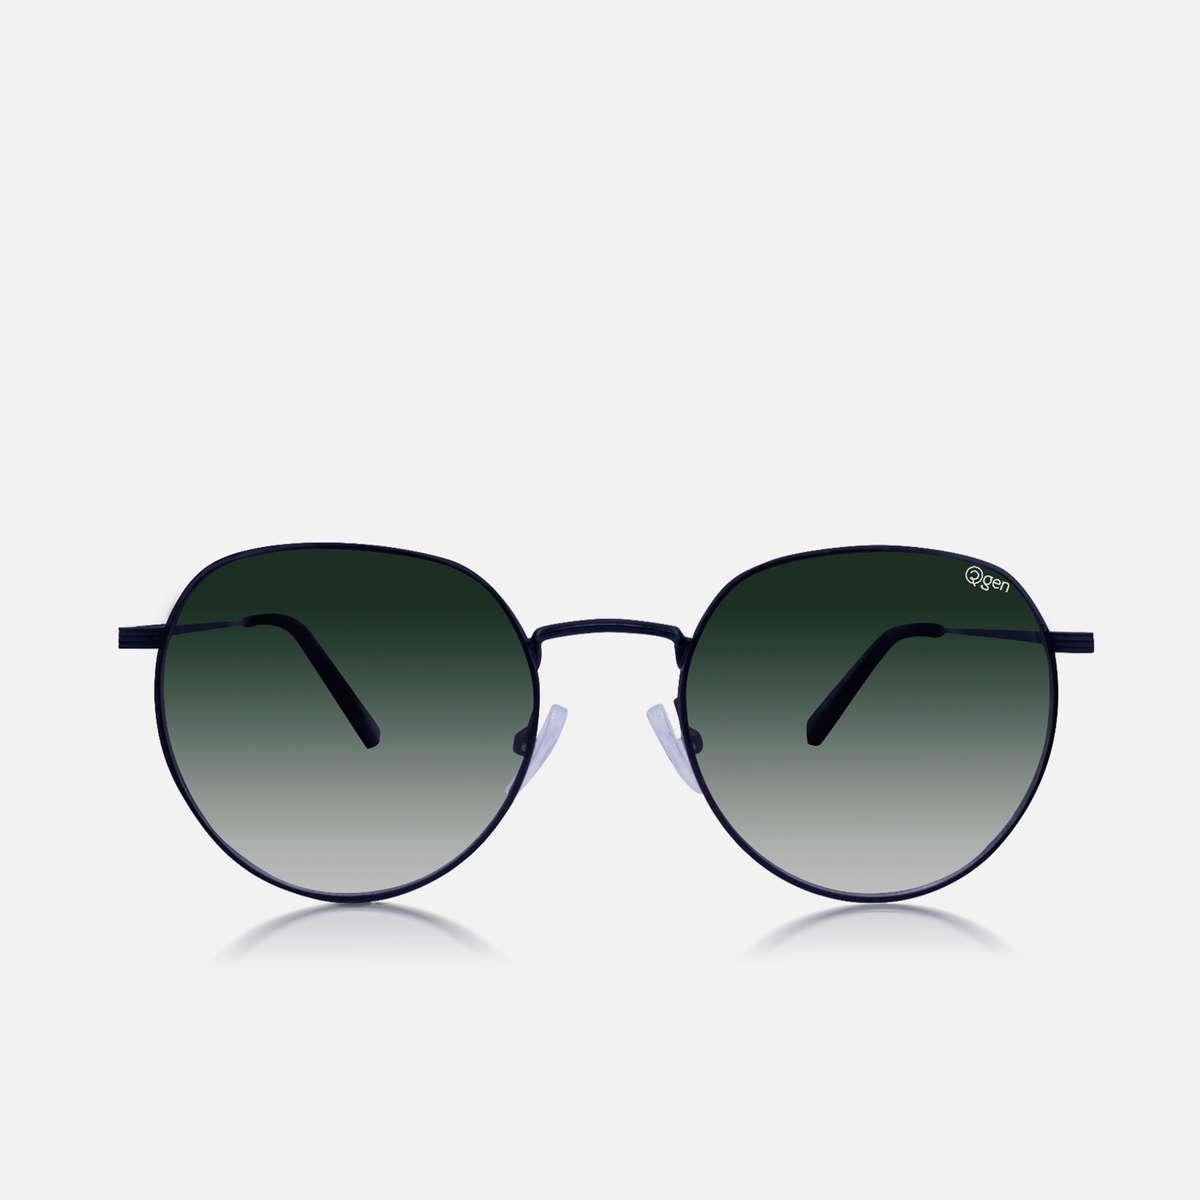 3.O2GEN Women Solid Round Sunglasses - O2-21-005-C3